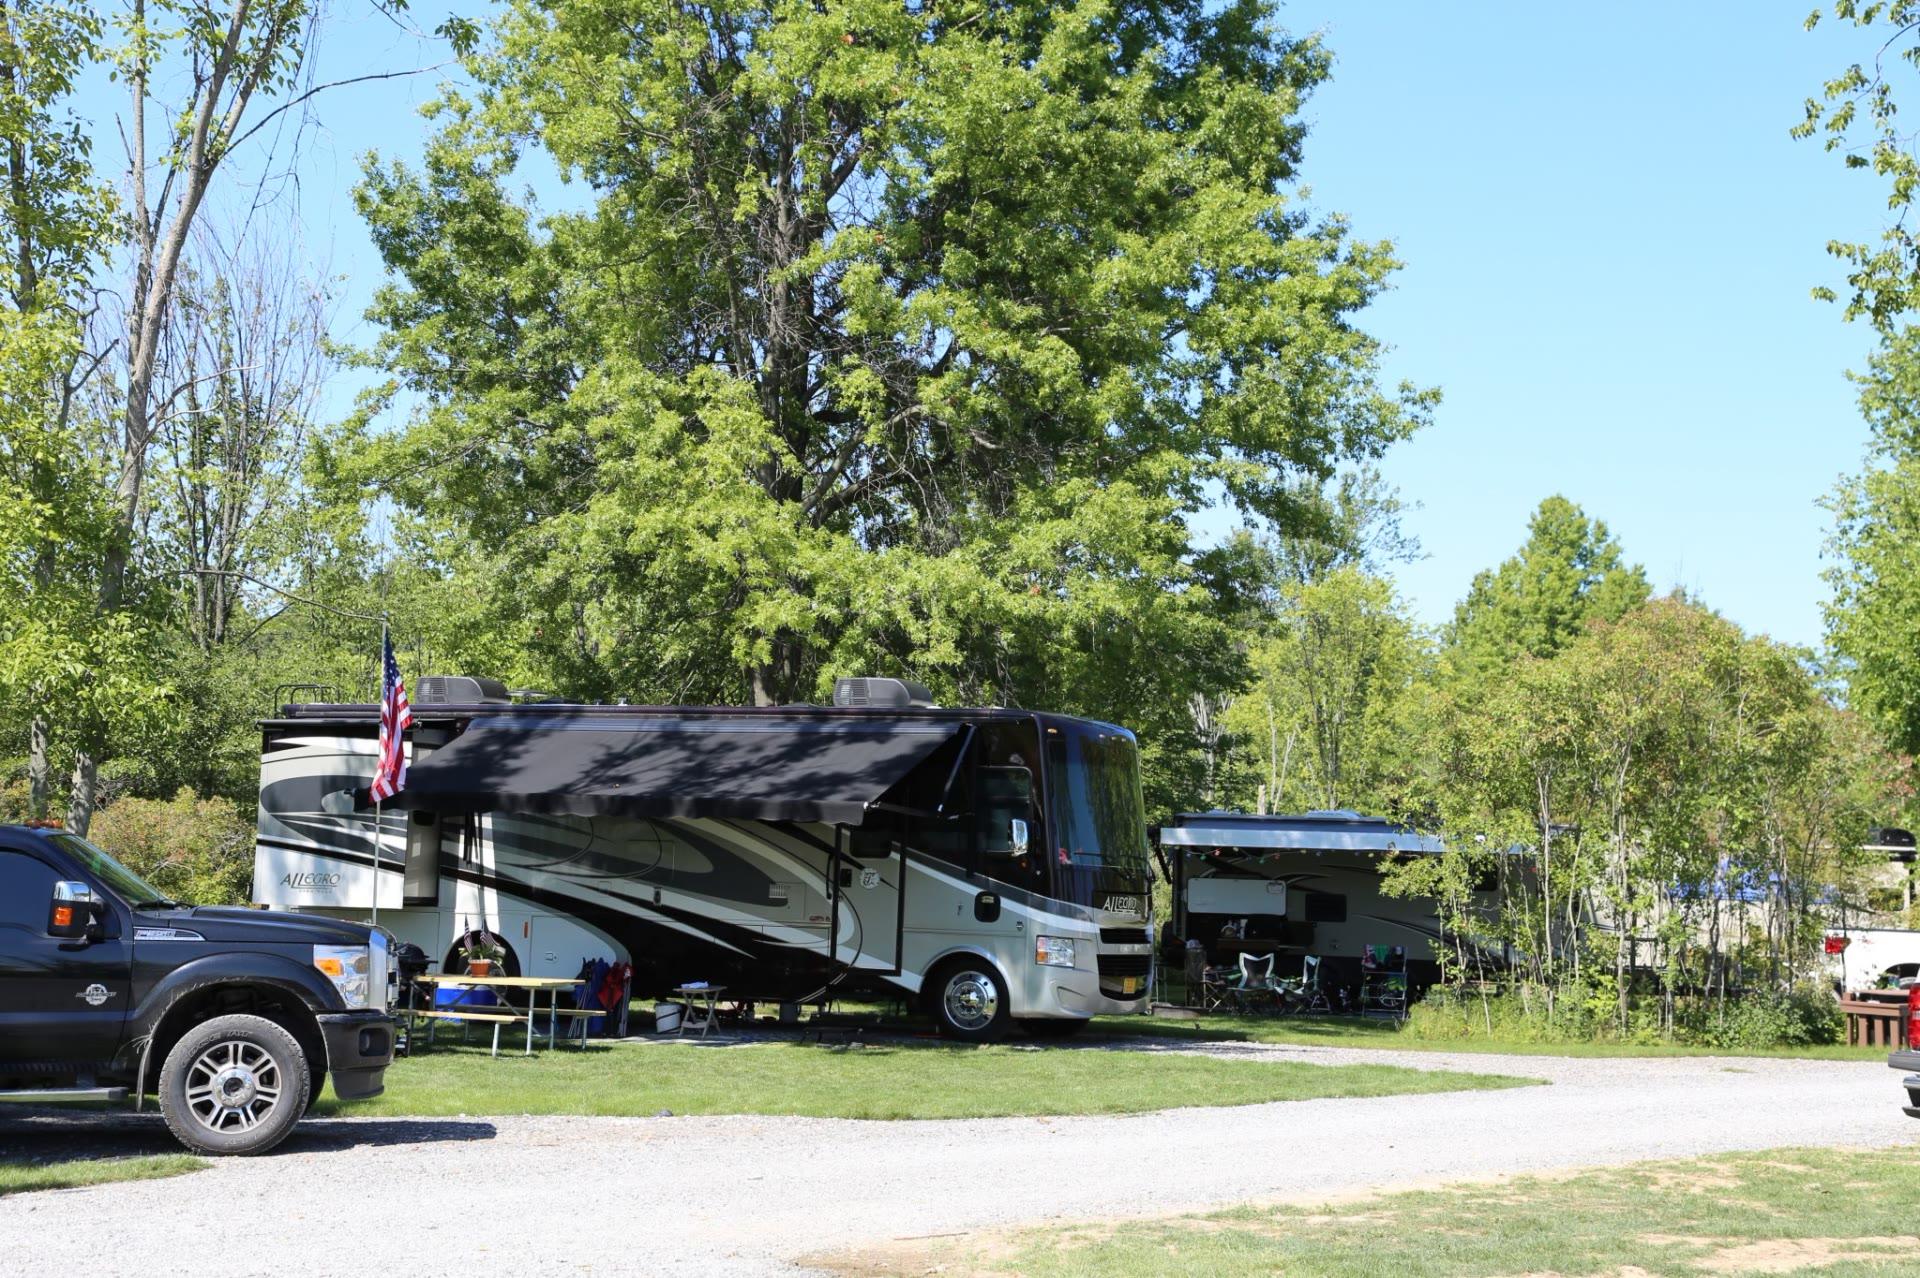 Several RVs at campground